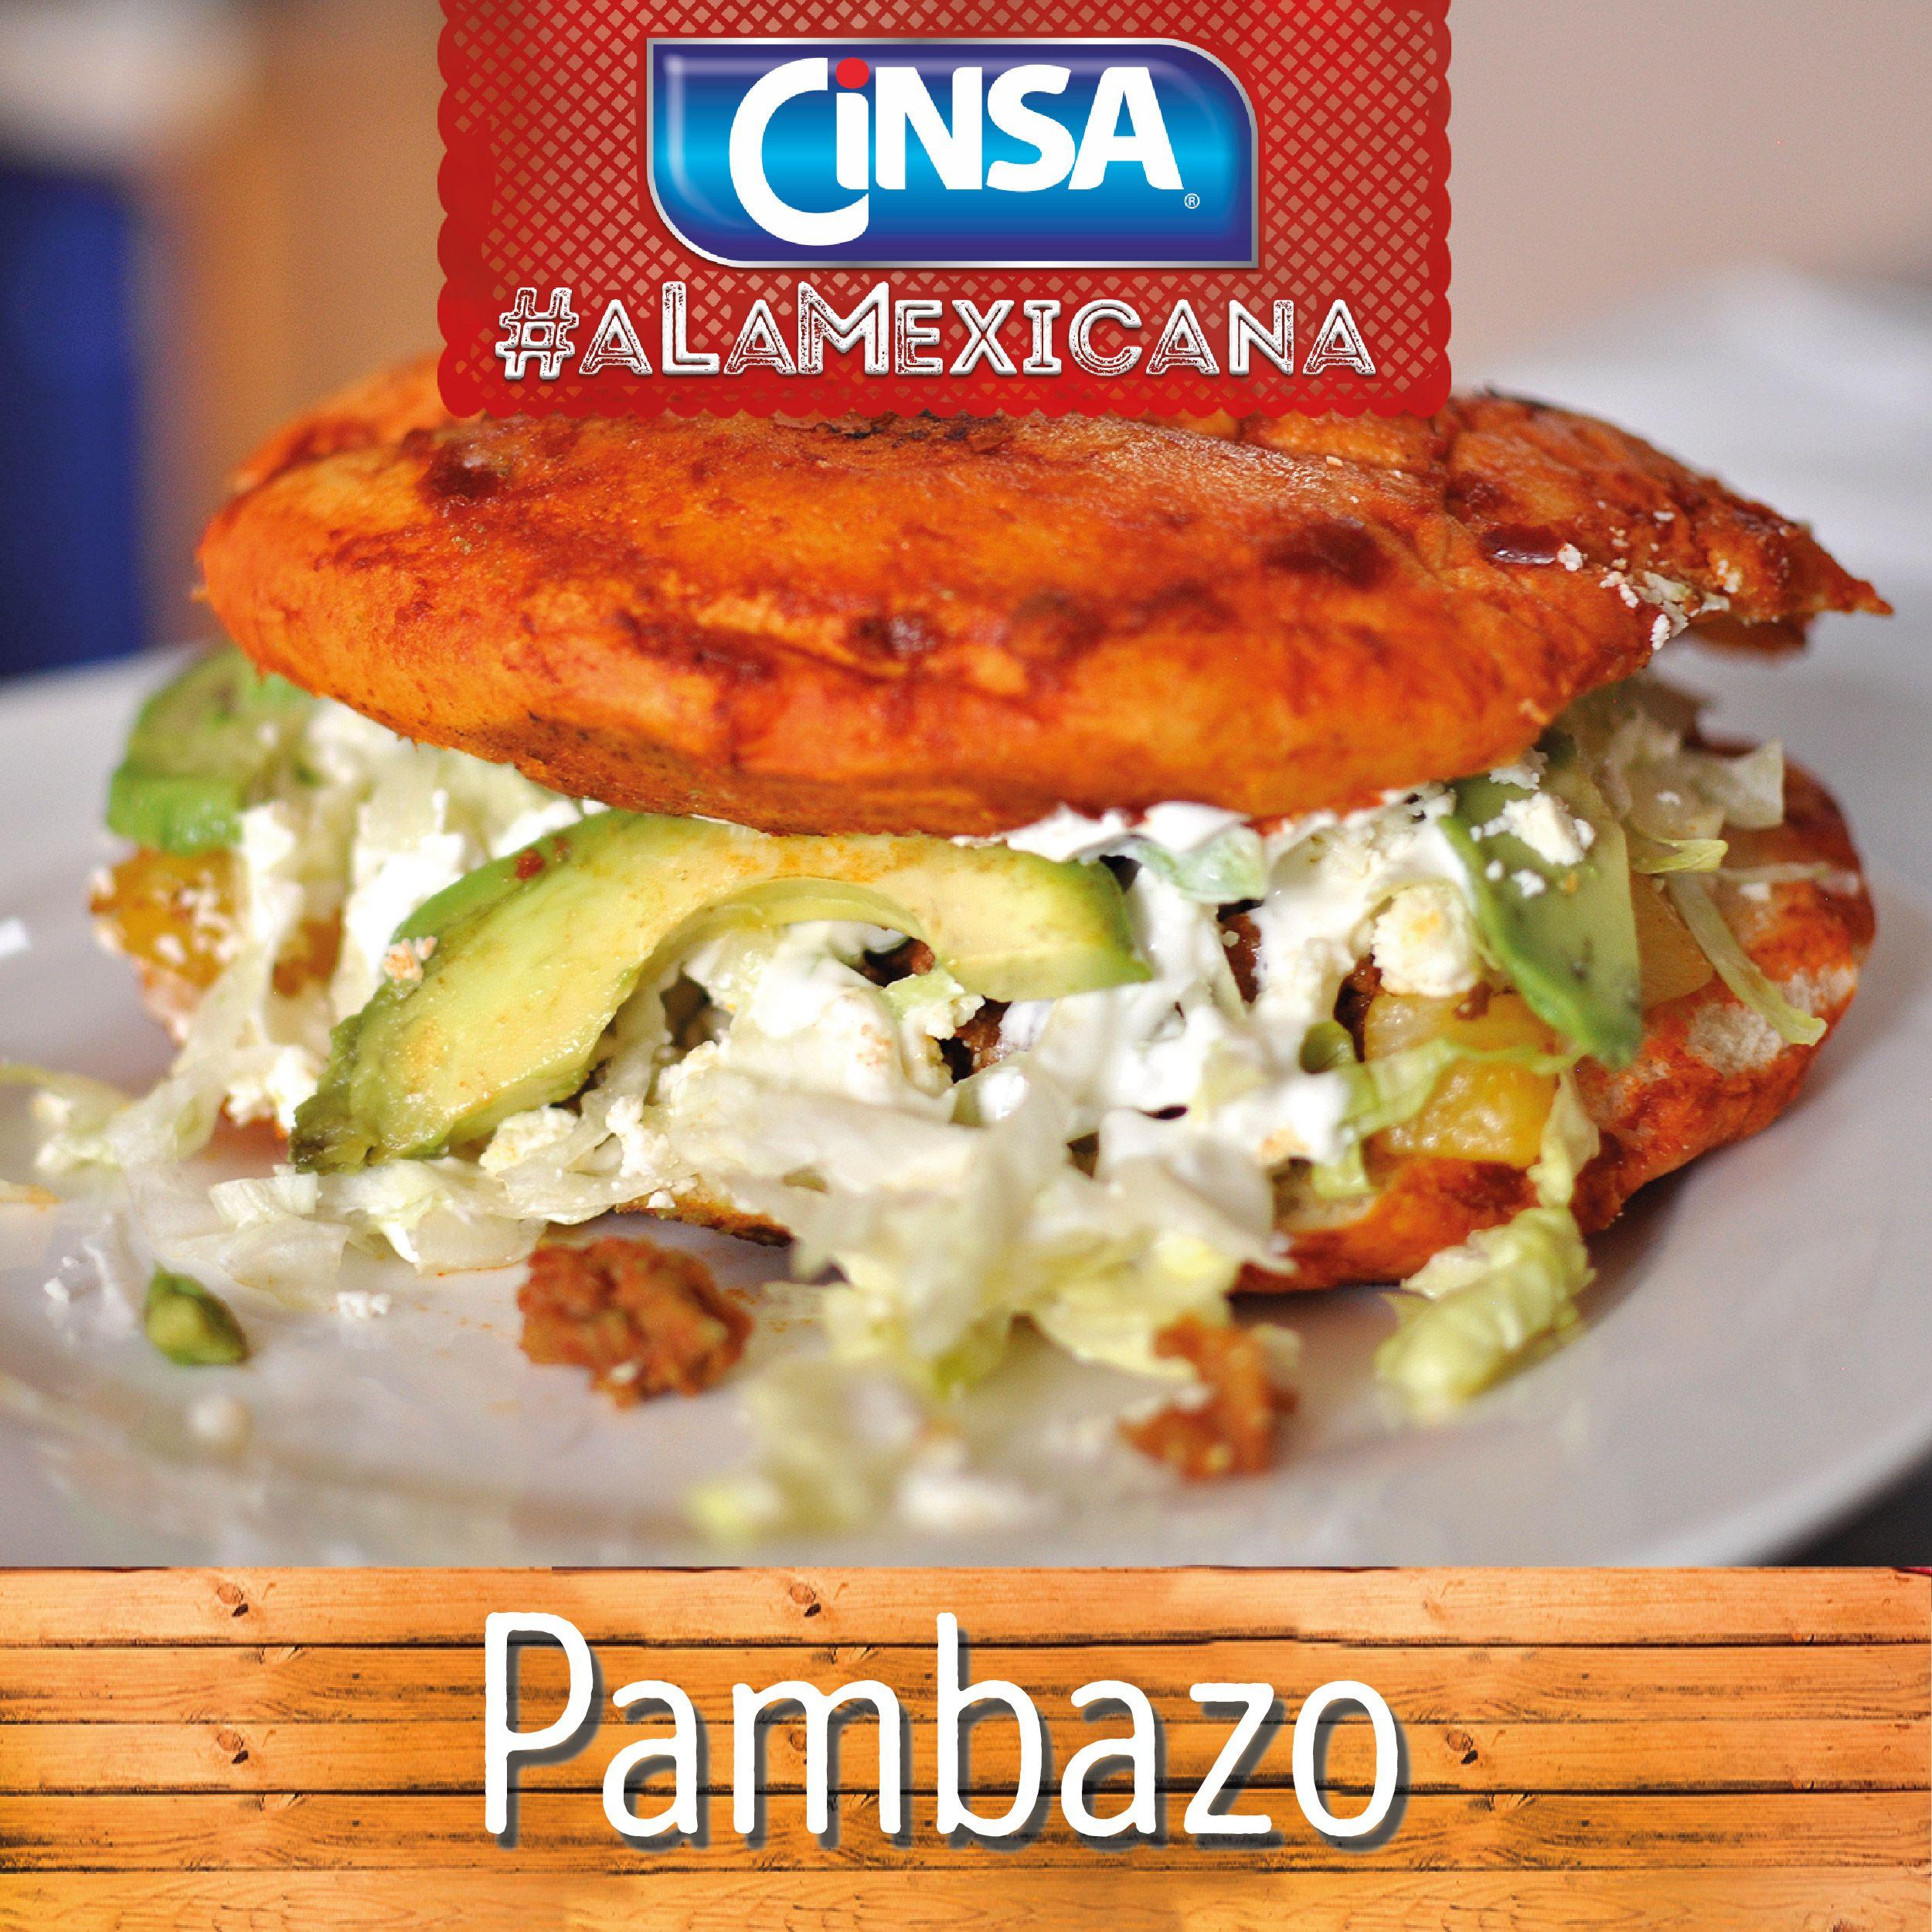 #Cinsa #CinsaALaMexicana #Recetas #Mexicanas #RecetasMexicanas #México #Comida #ComidaMexicana #peltre #MarcasMexicanas #Pambazo #EstadoDeMexico